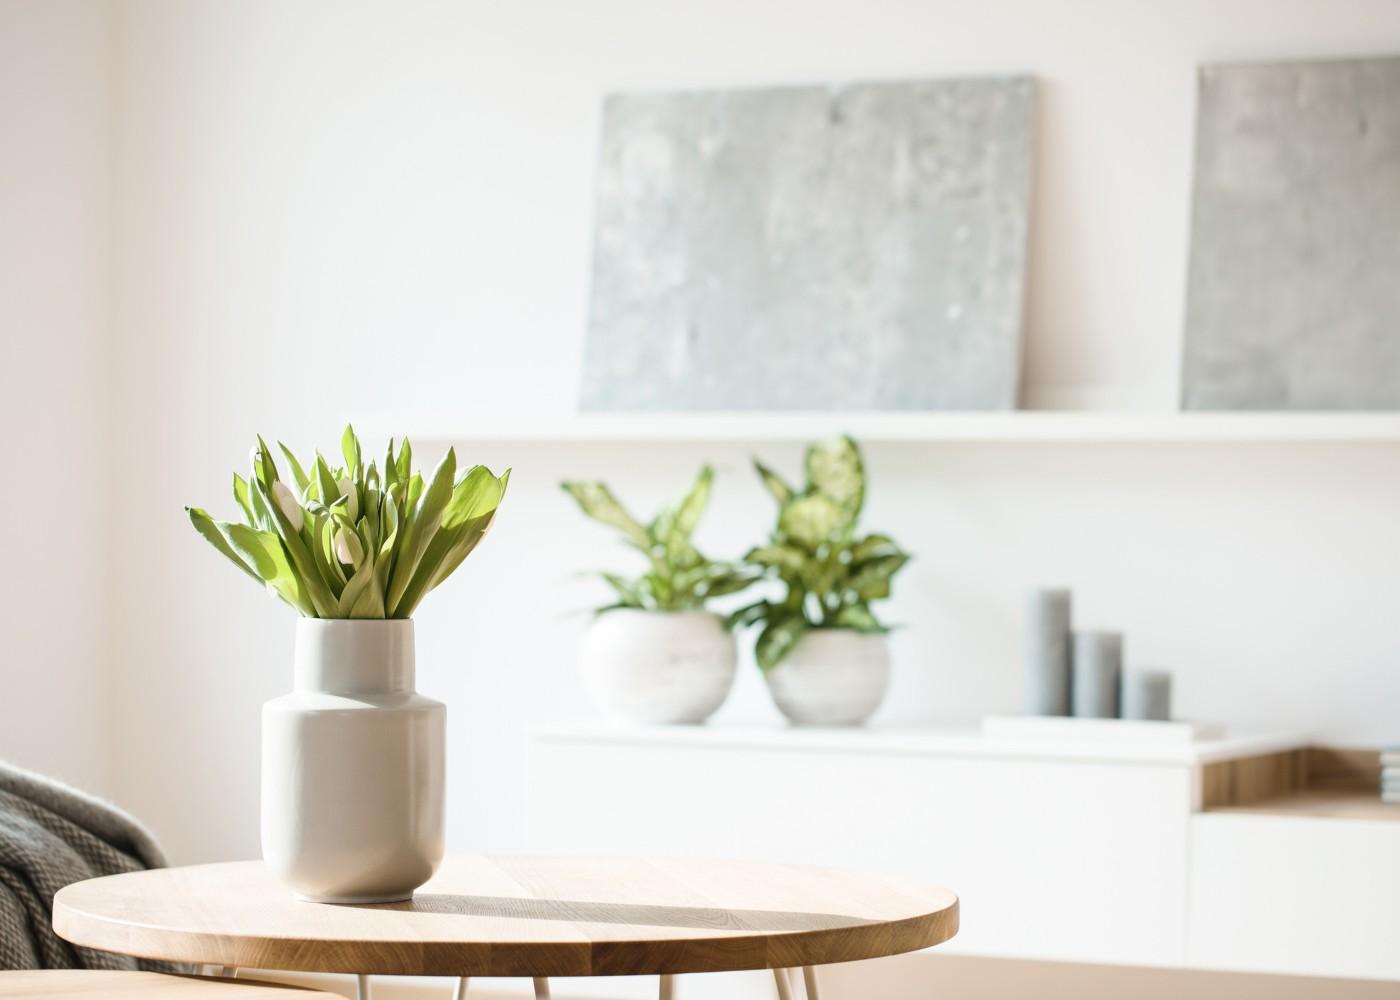 plantas num vaso numa mesa em sala de estar